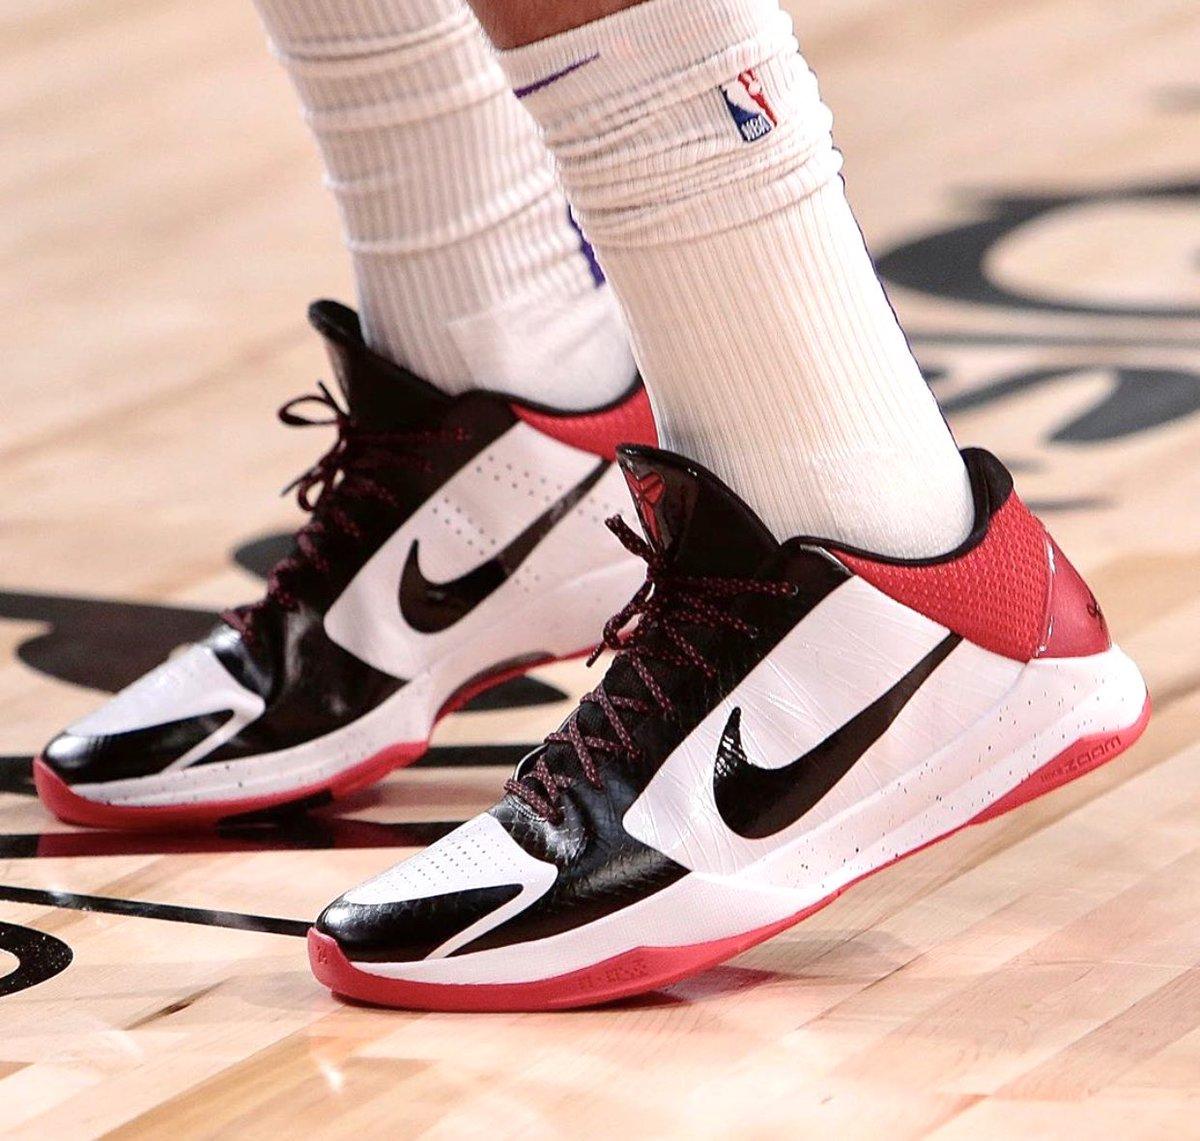 "Black Toe"" Kobe 5"